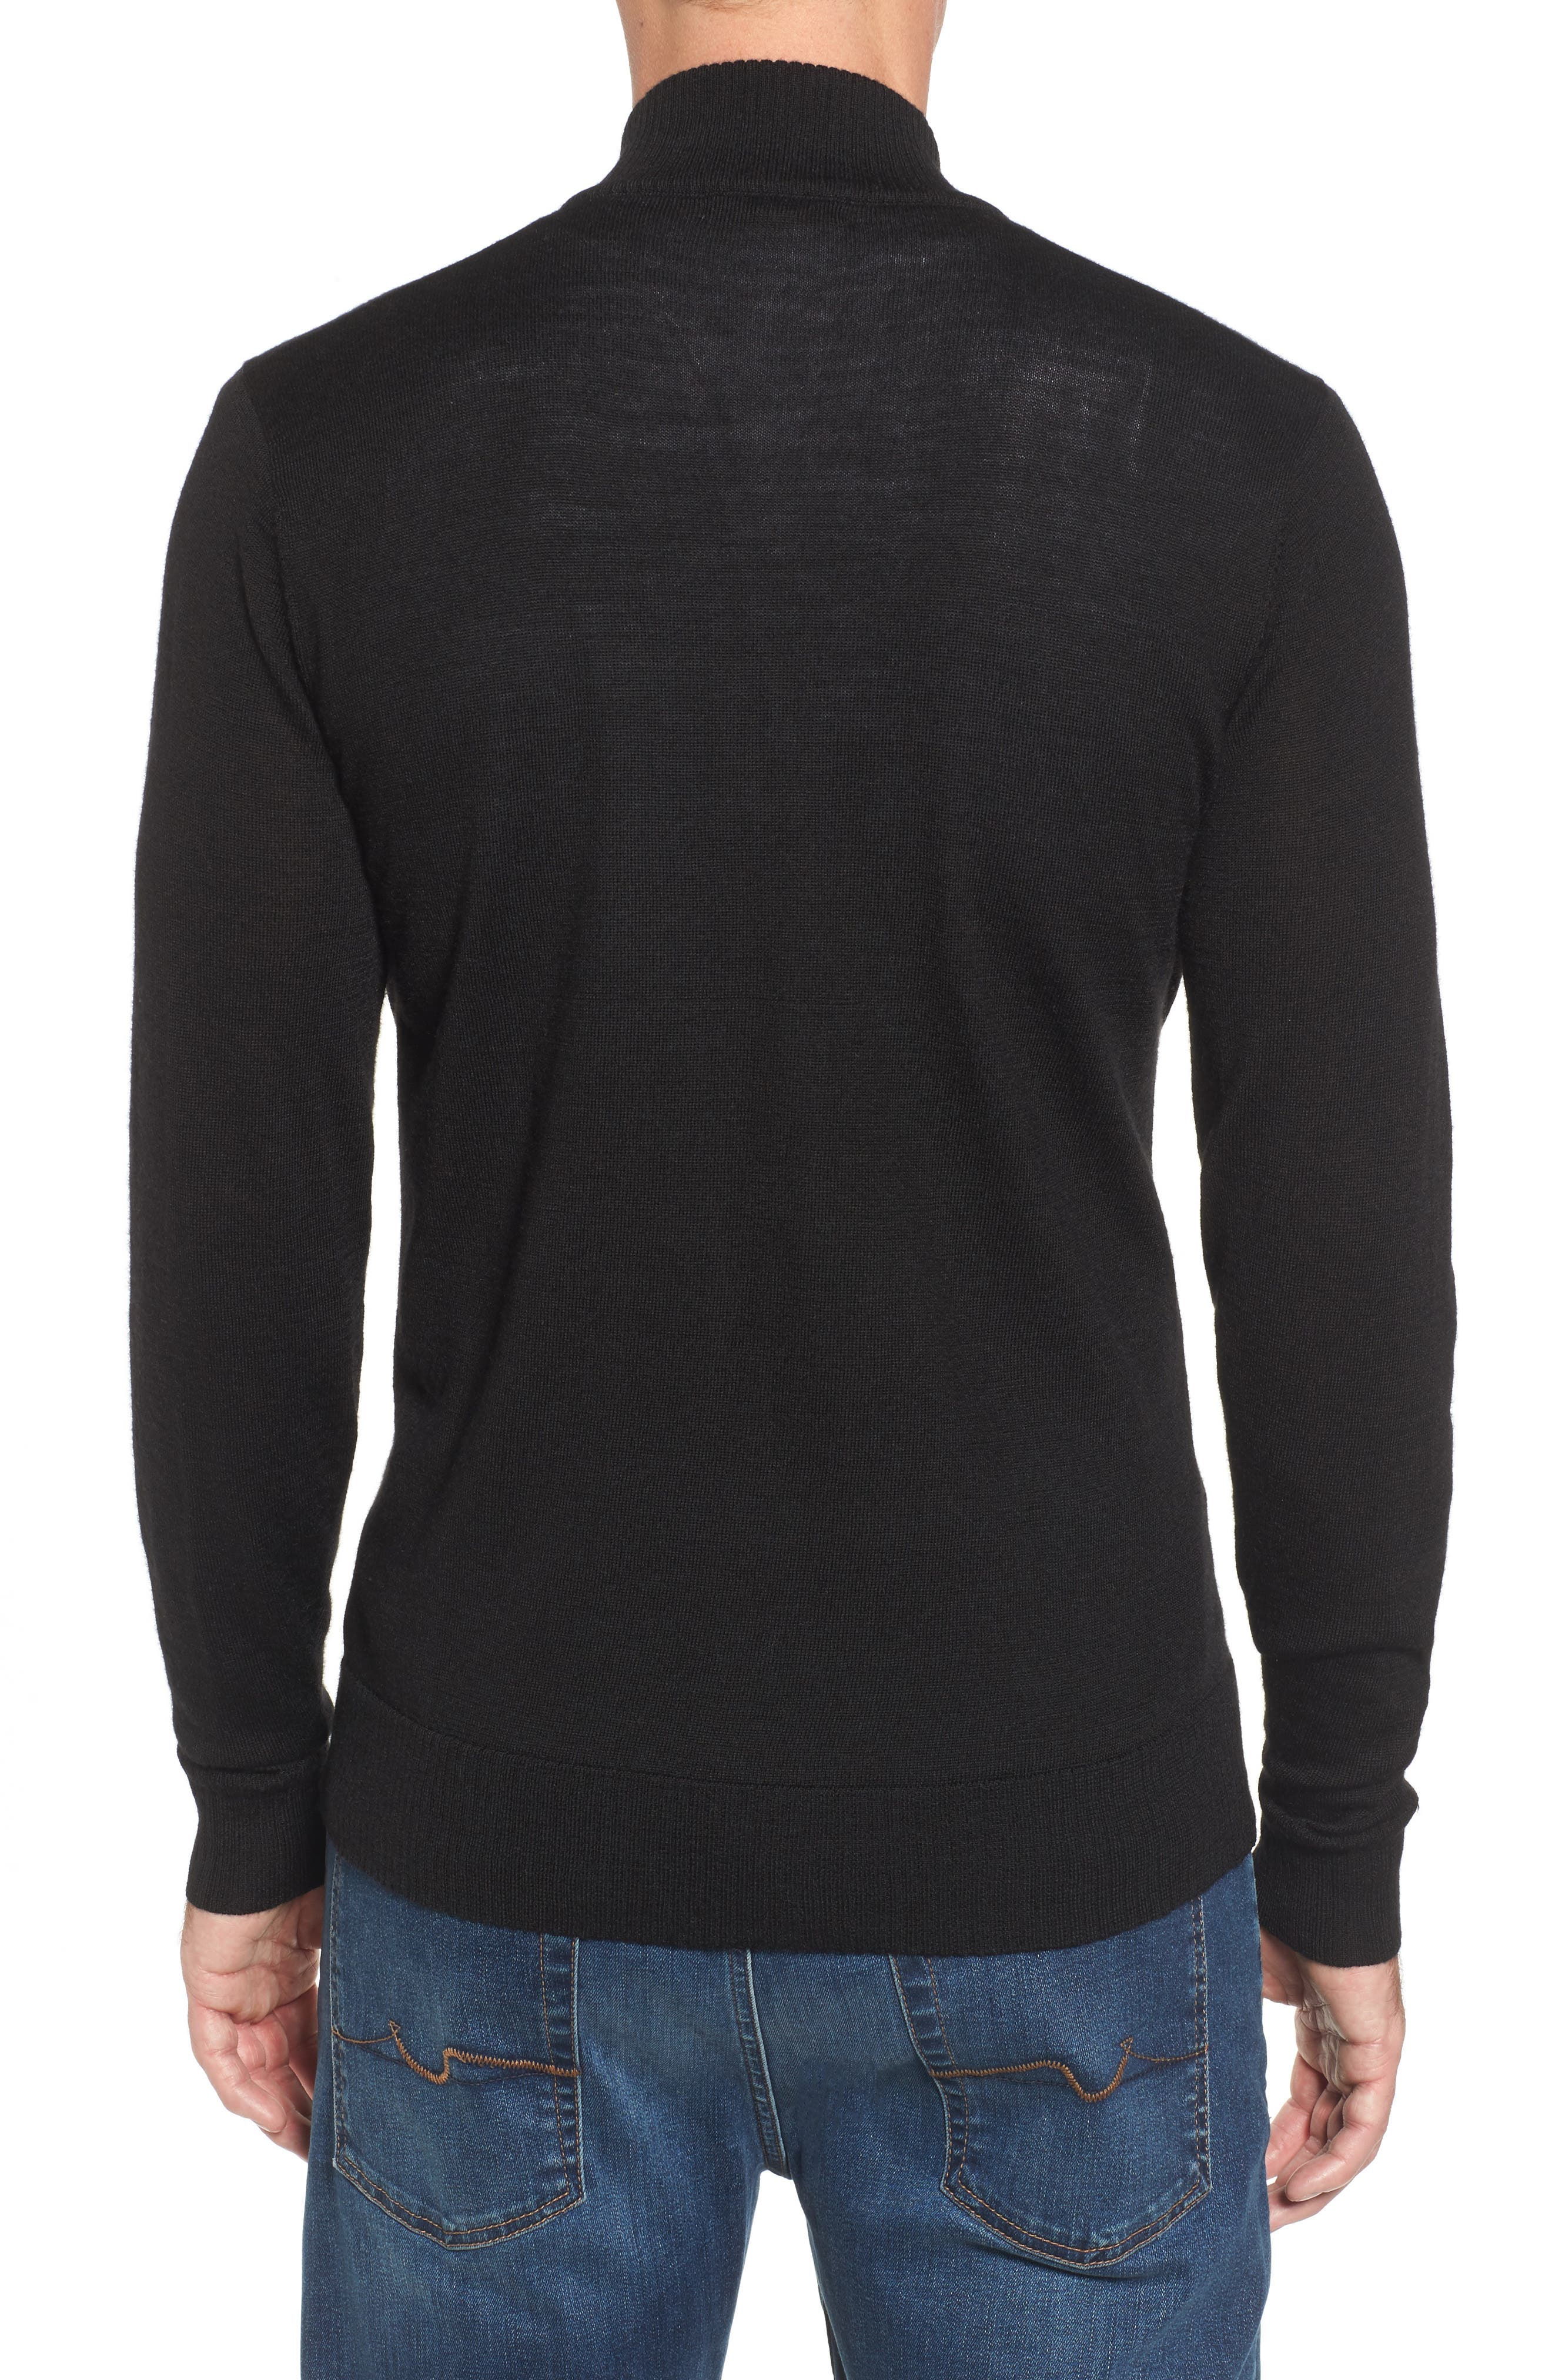 Kiva Ridge Merino Wool Blend Pullover,                             Alternate thumbnail 2, color,                             001